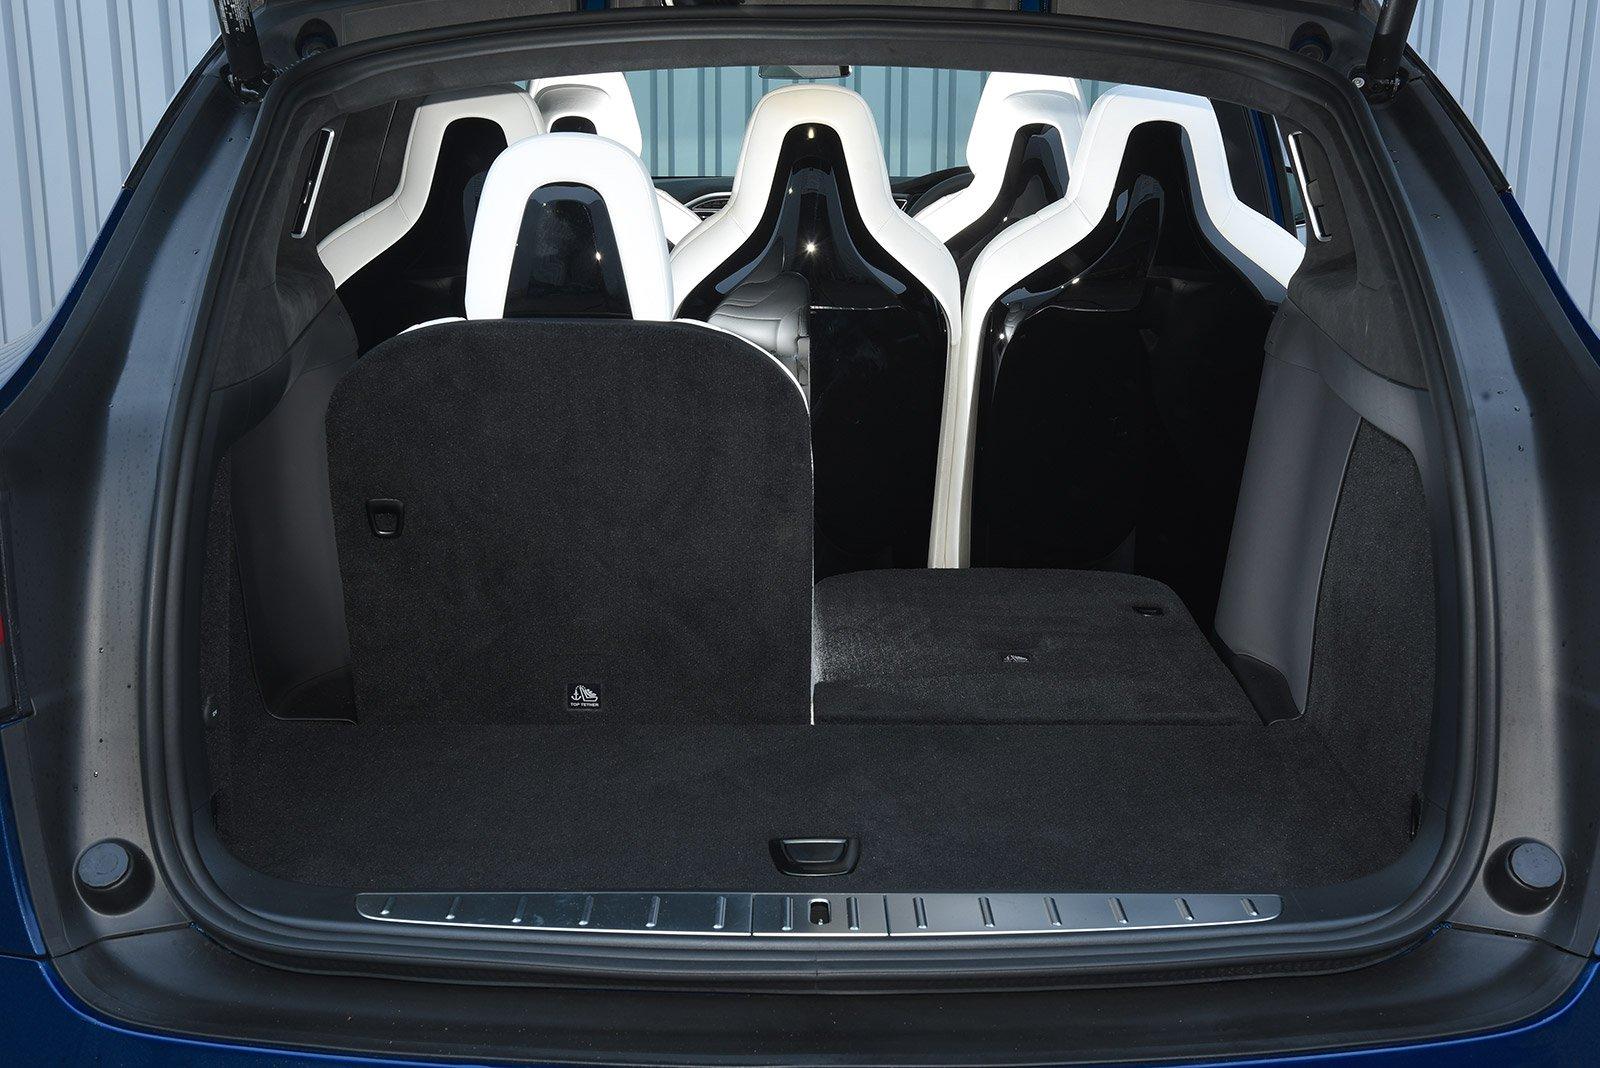 SEVEN-SEATER: Tesla Model X (7 seat) interior